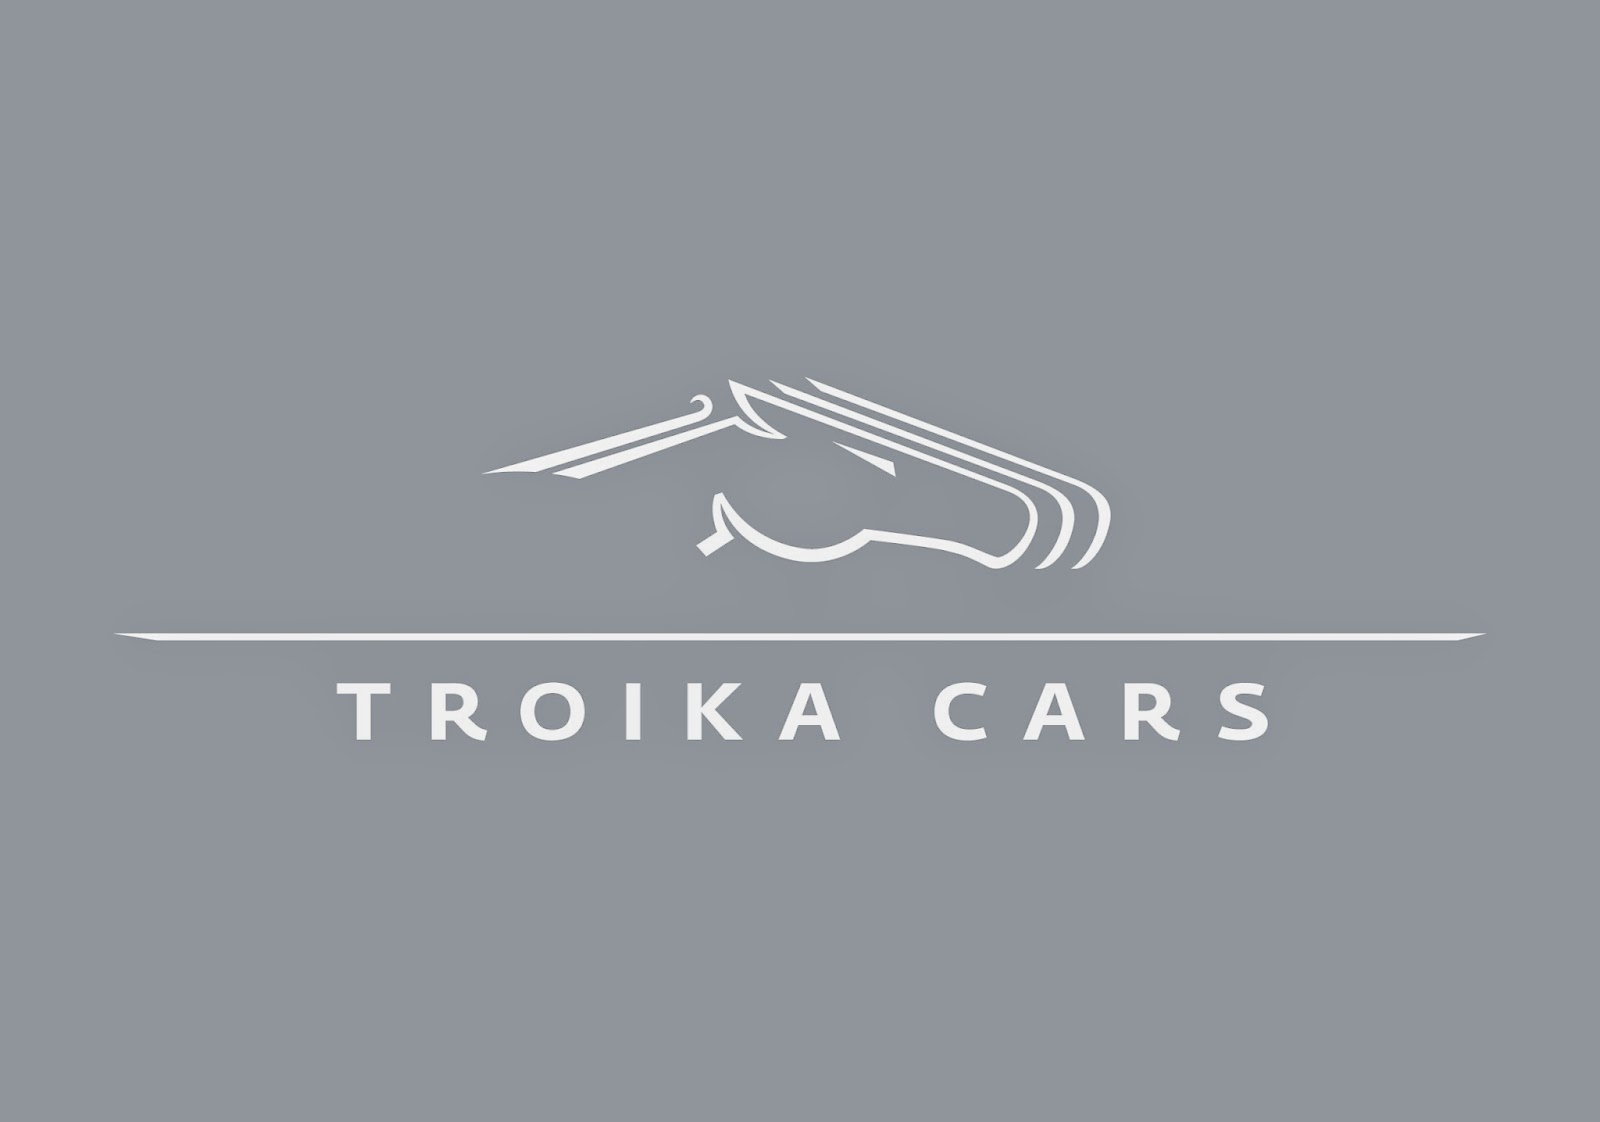 Troika Cars